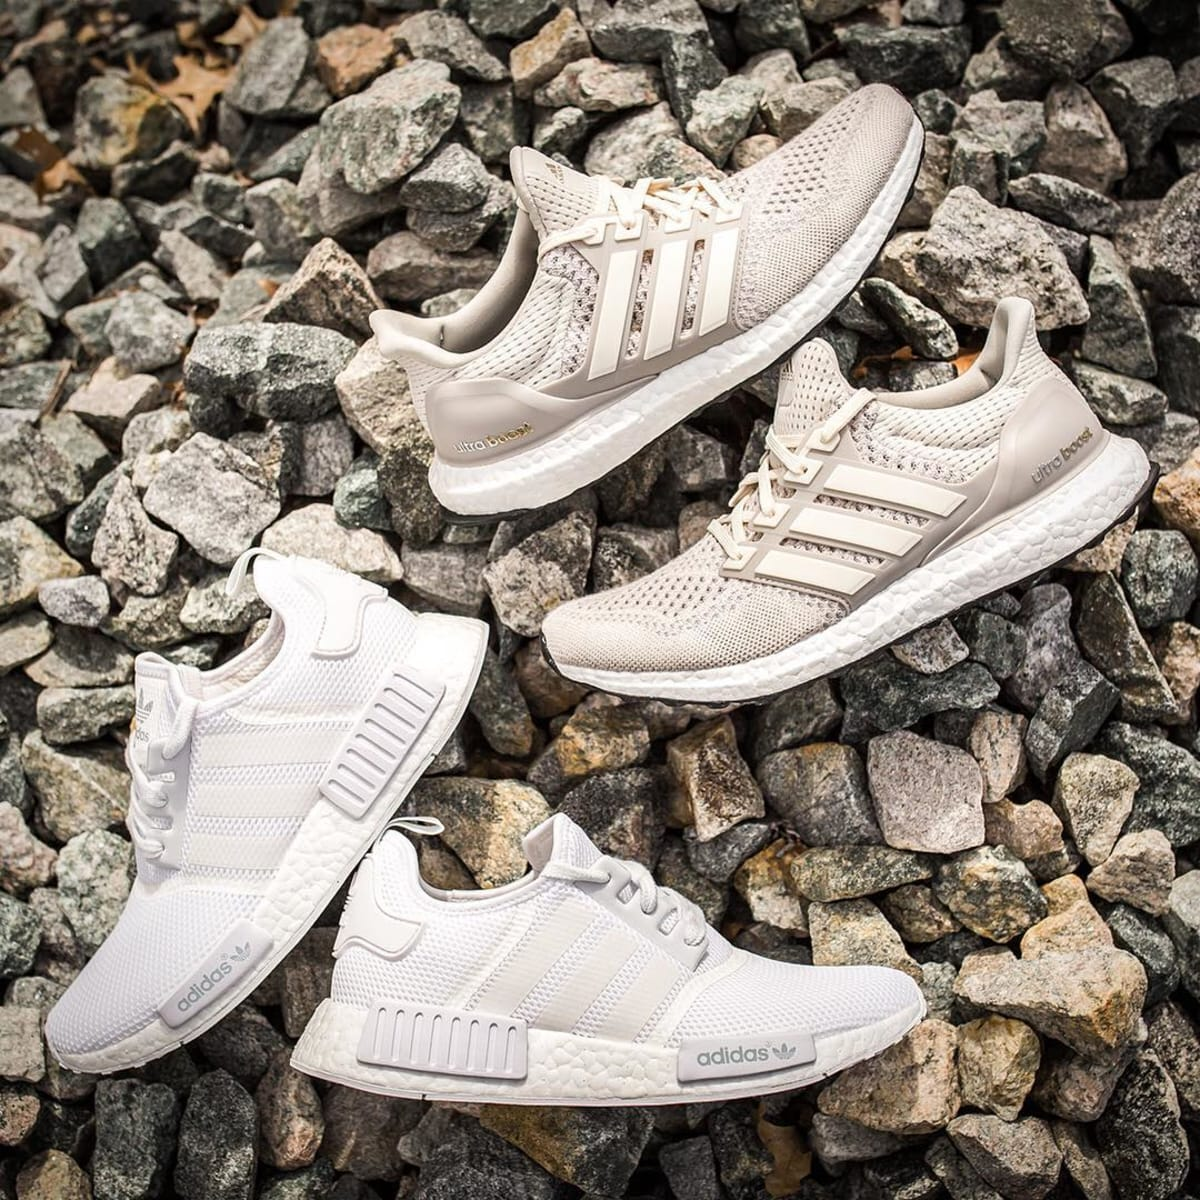 on sale 99481 0413c White Adidas NMD Cream Ultra Boost Restock  Sole Collector